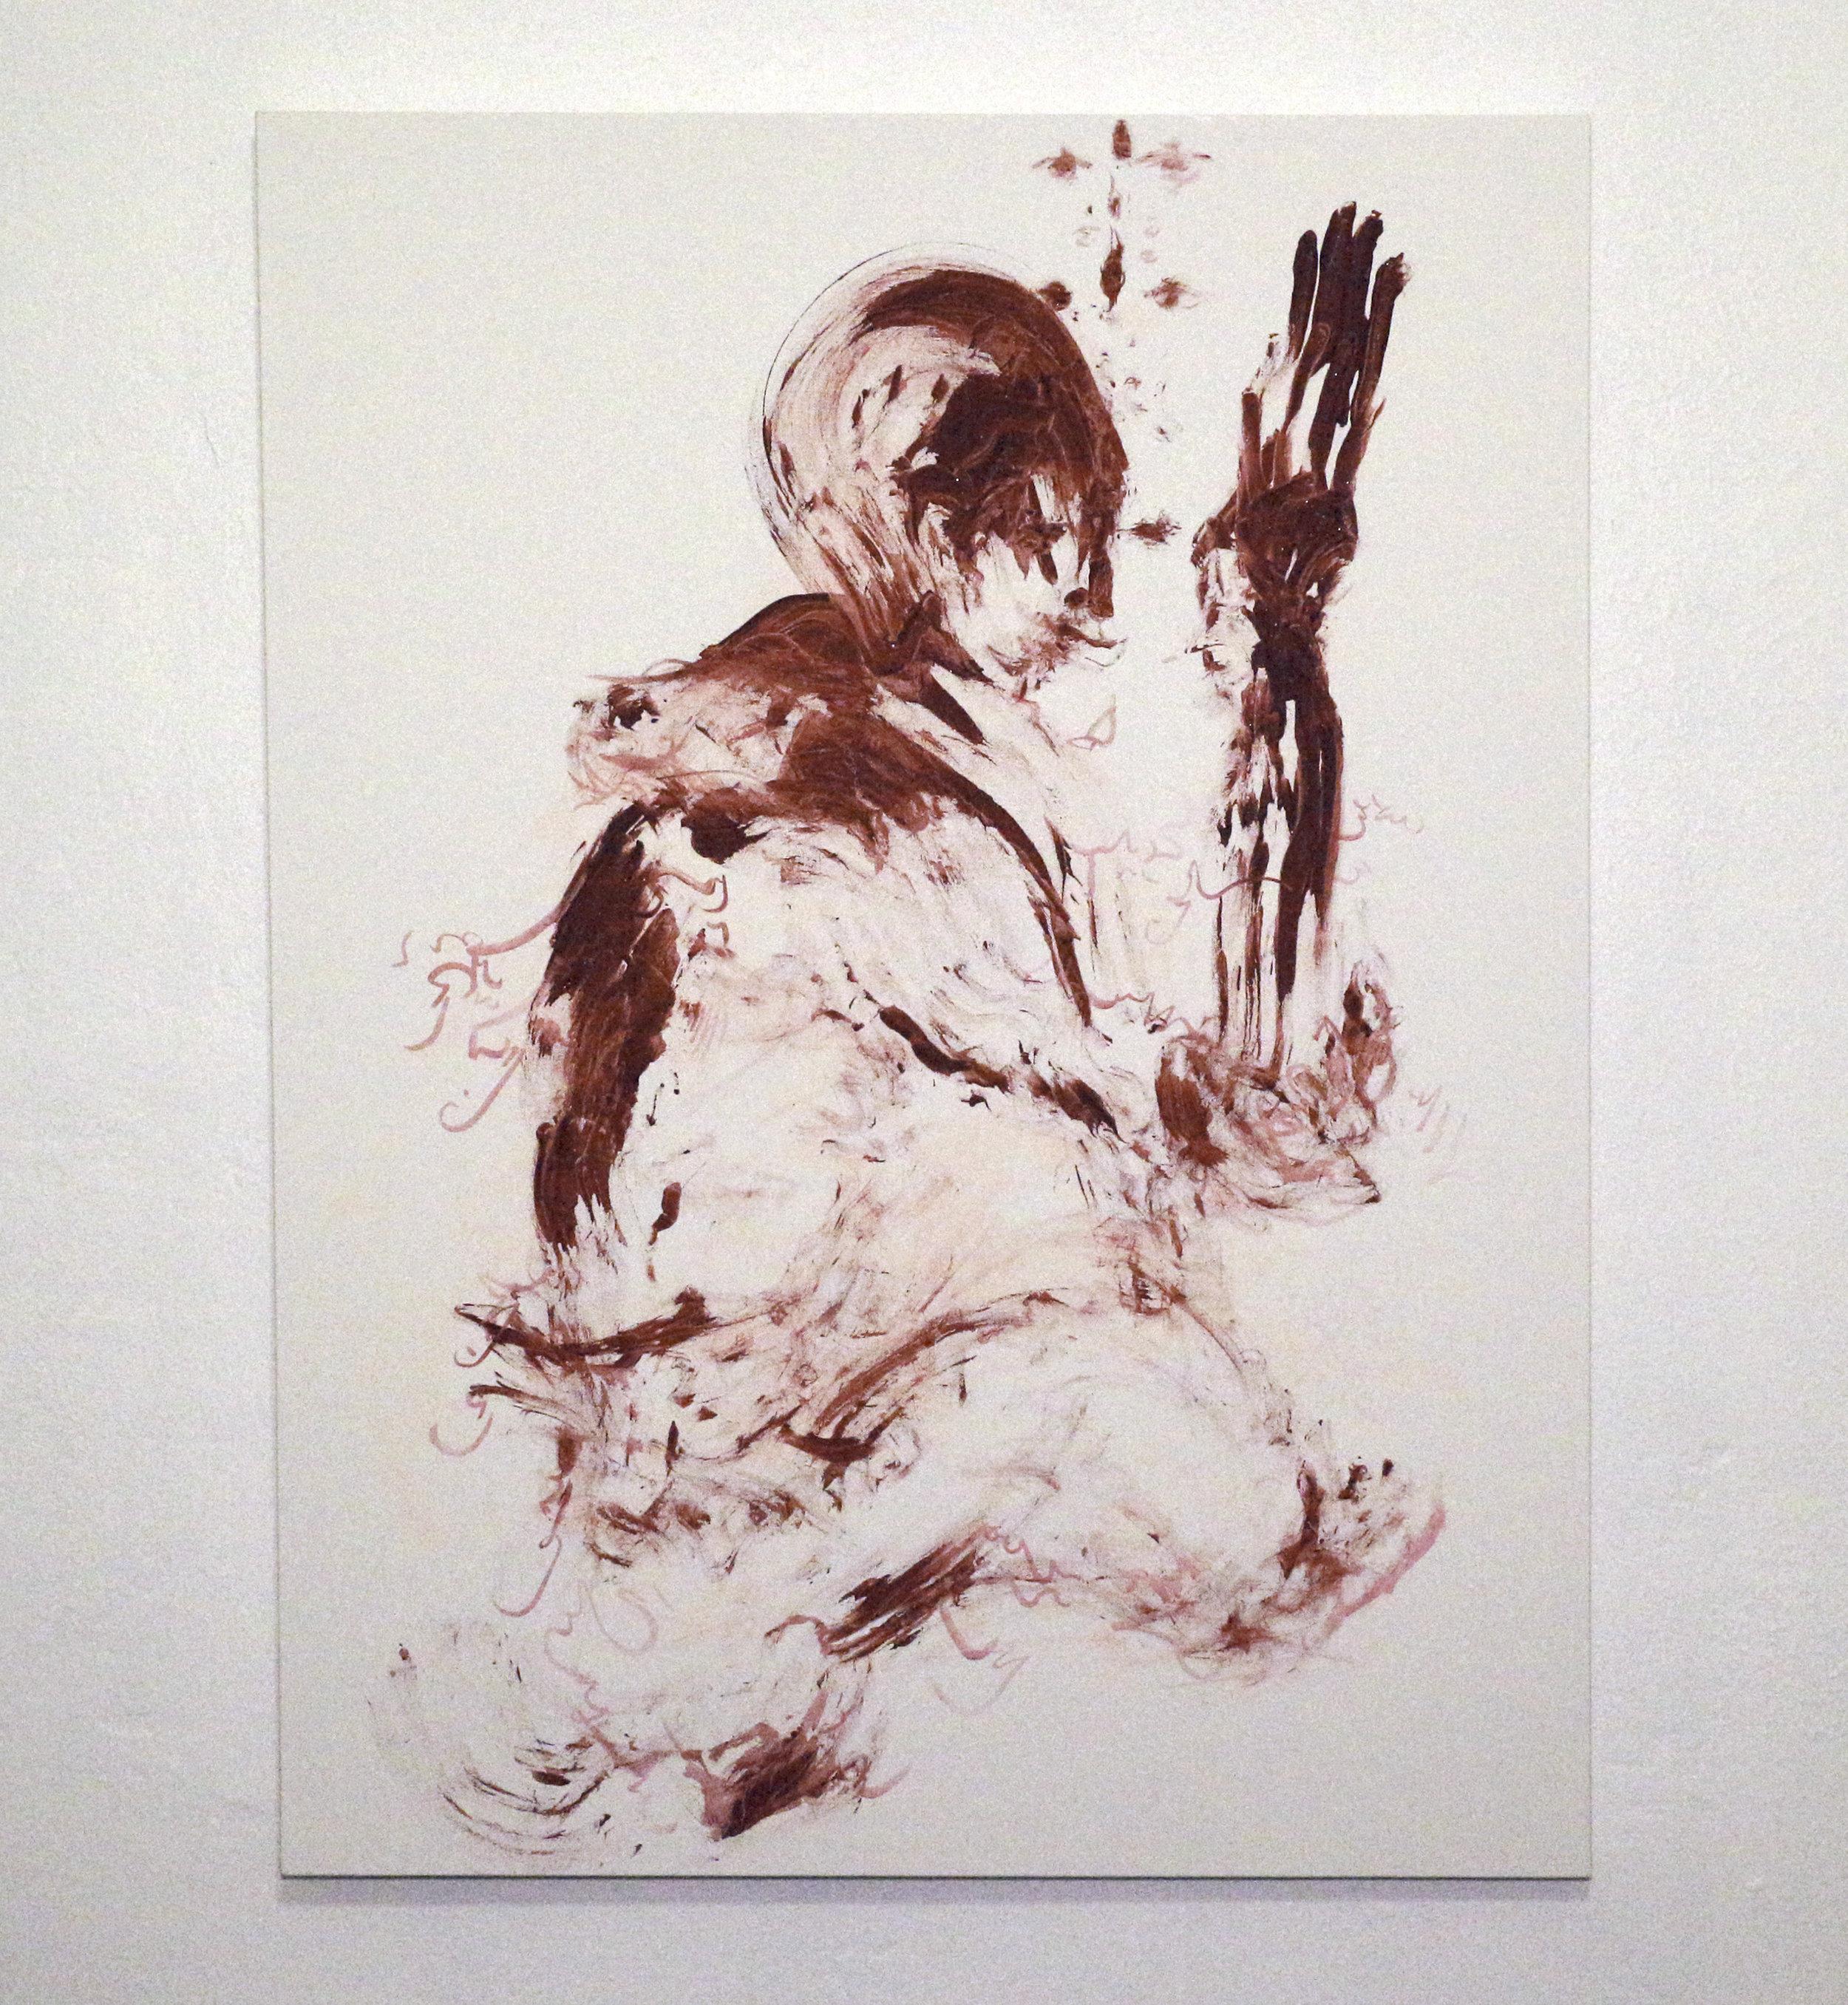 Michael Haight Art - Blood Ghosts